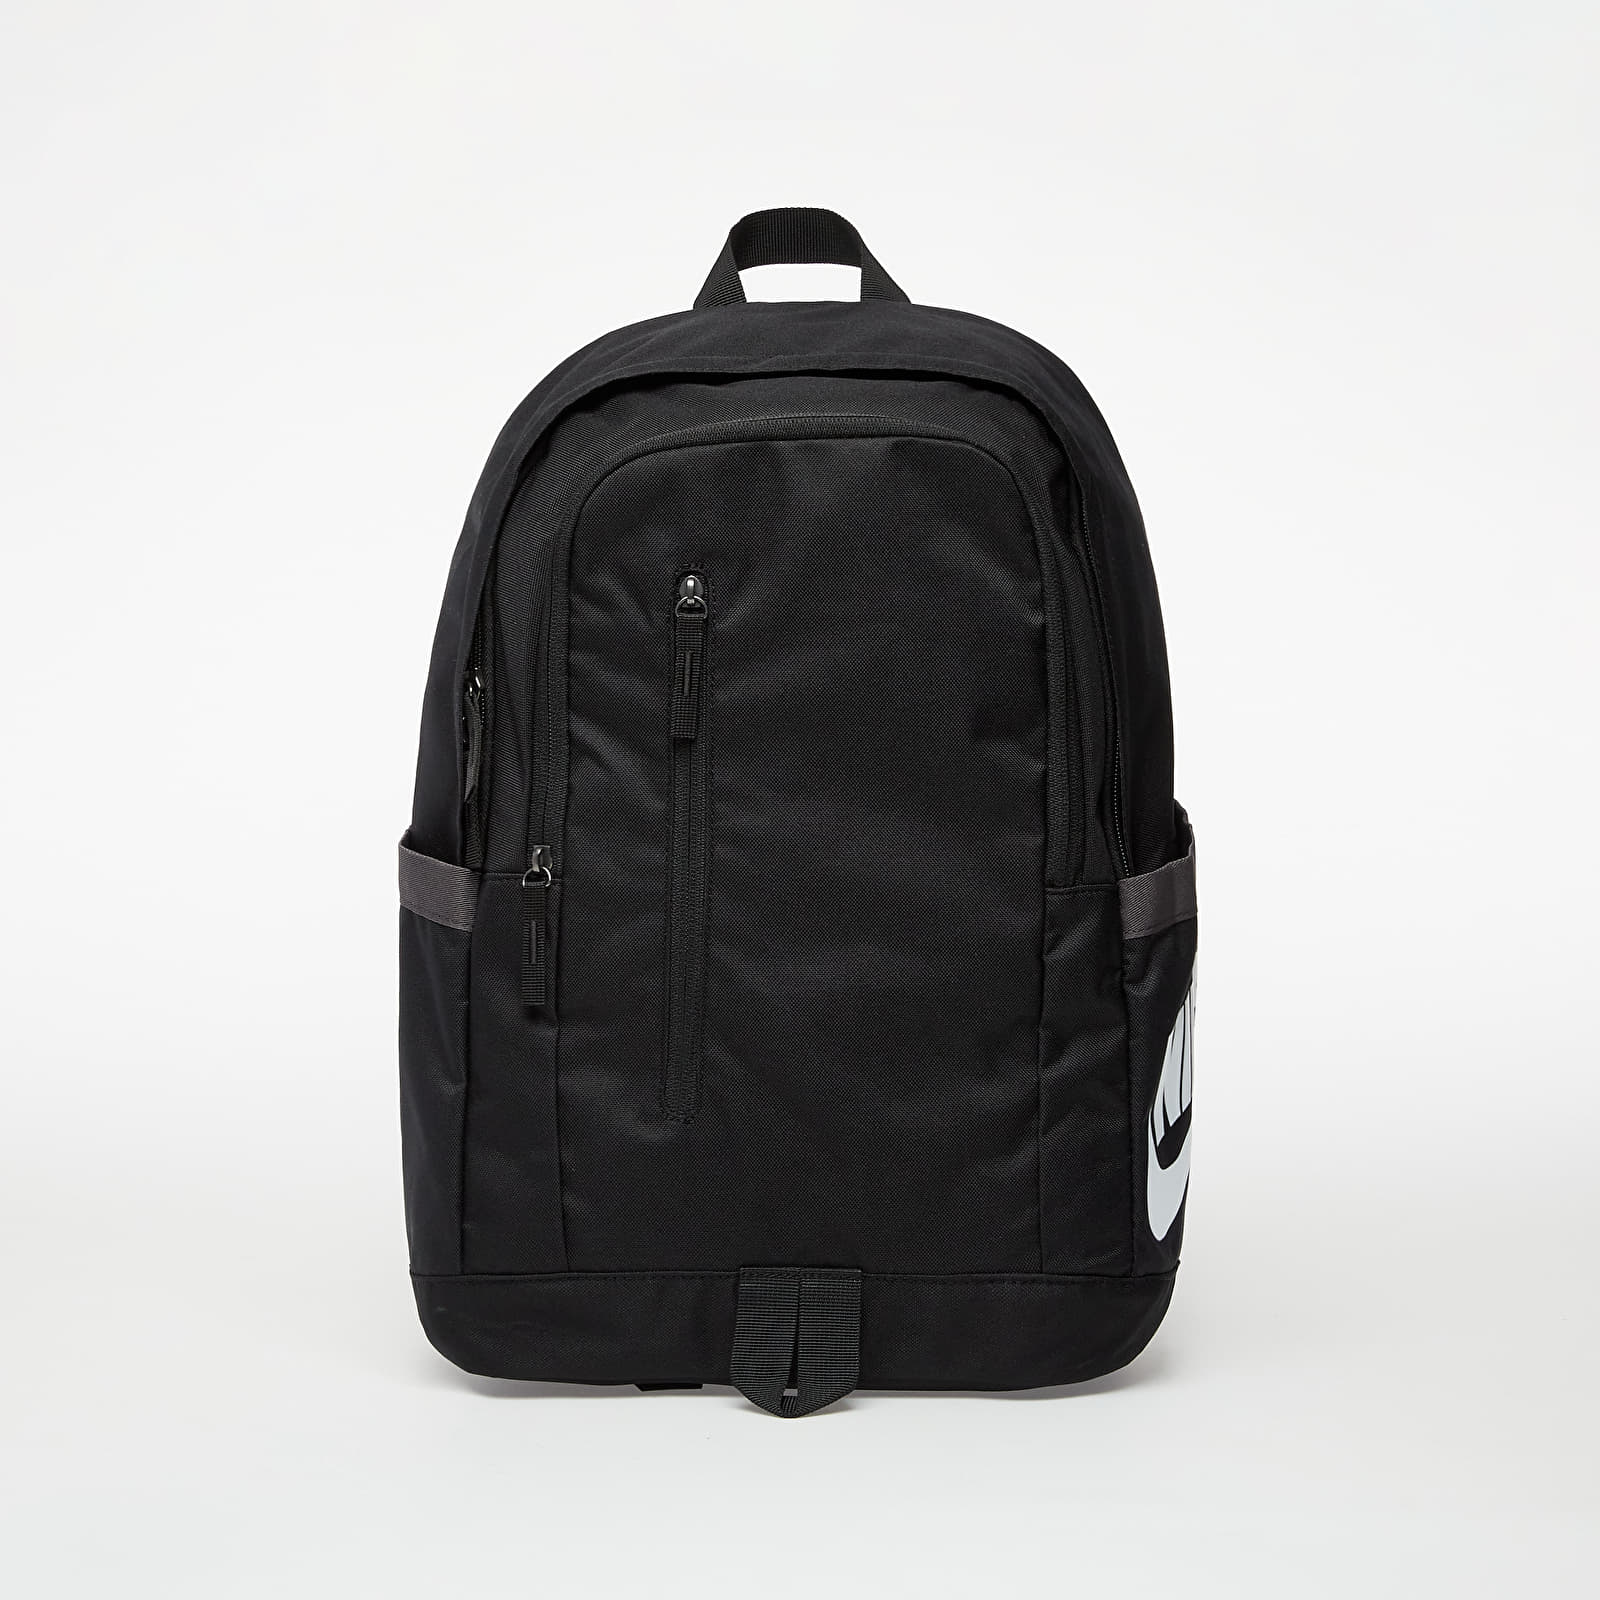 Rucksäcke Nike Akk Access Soleday Backpack Black